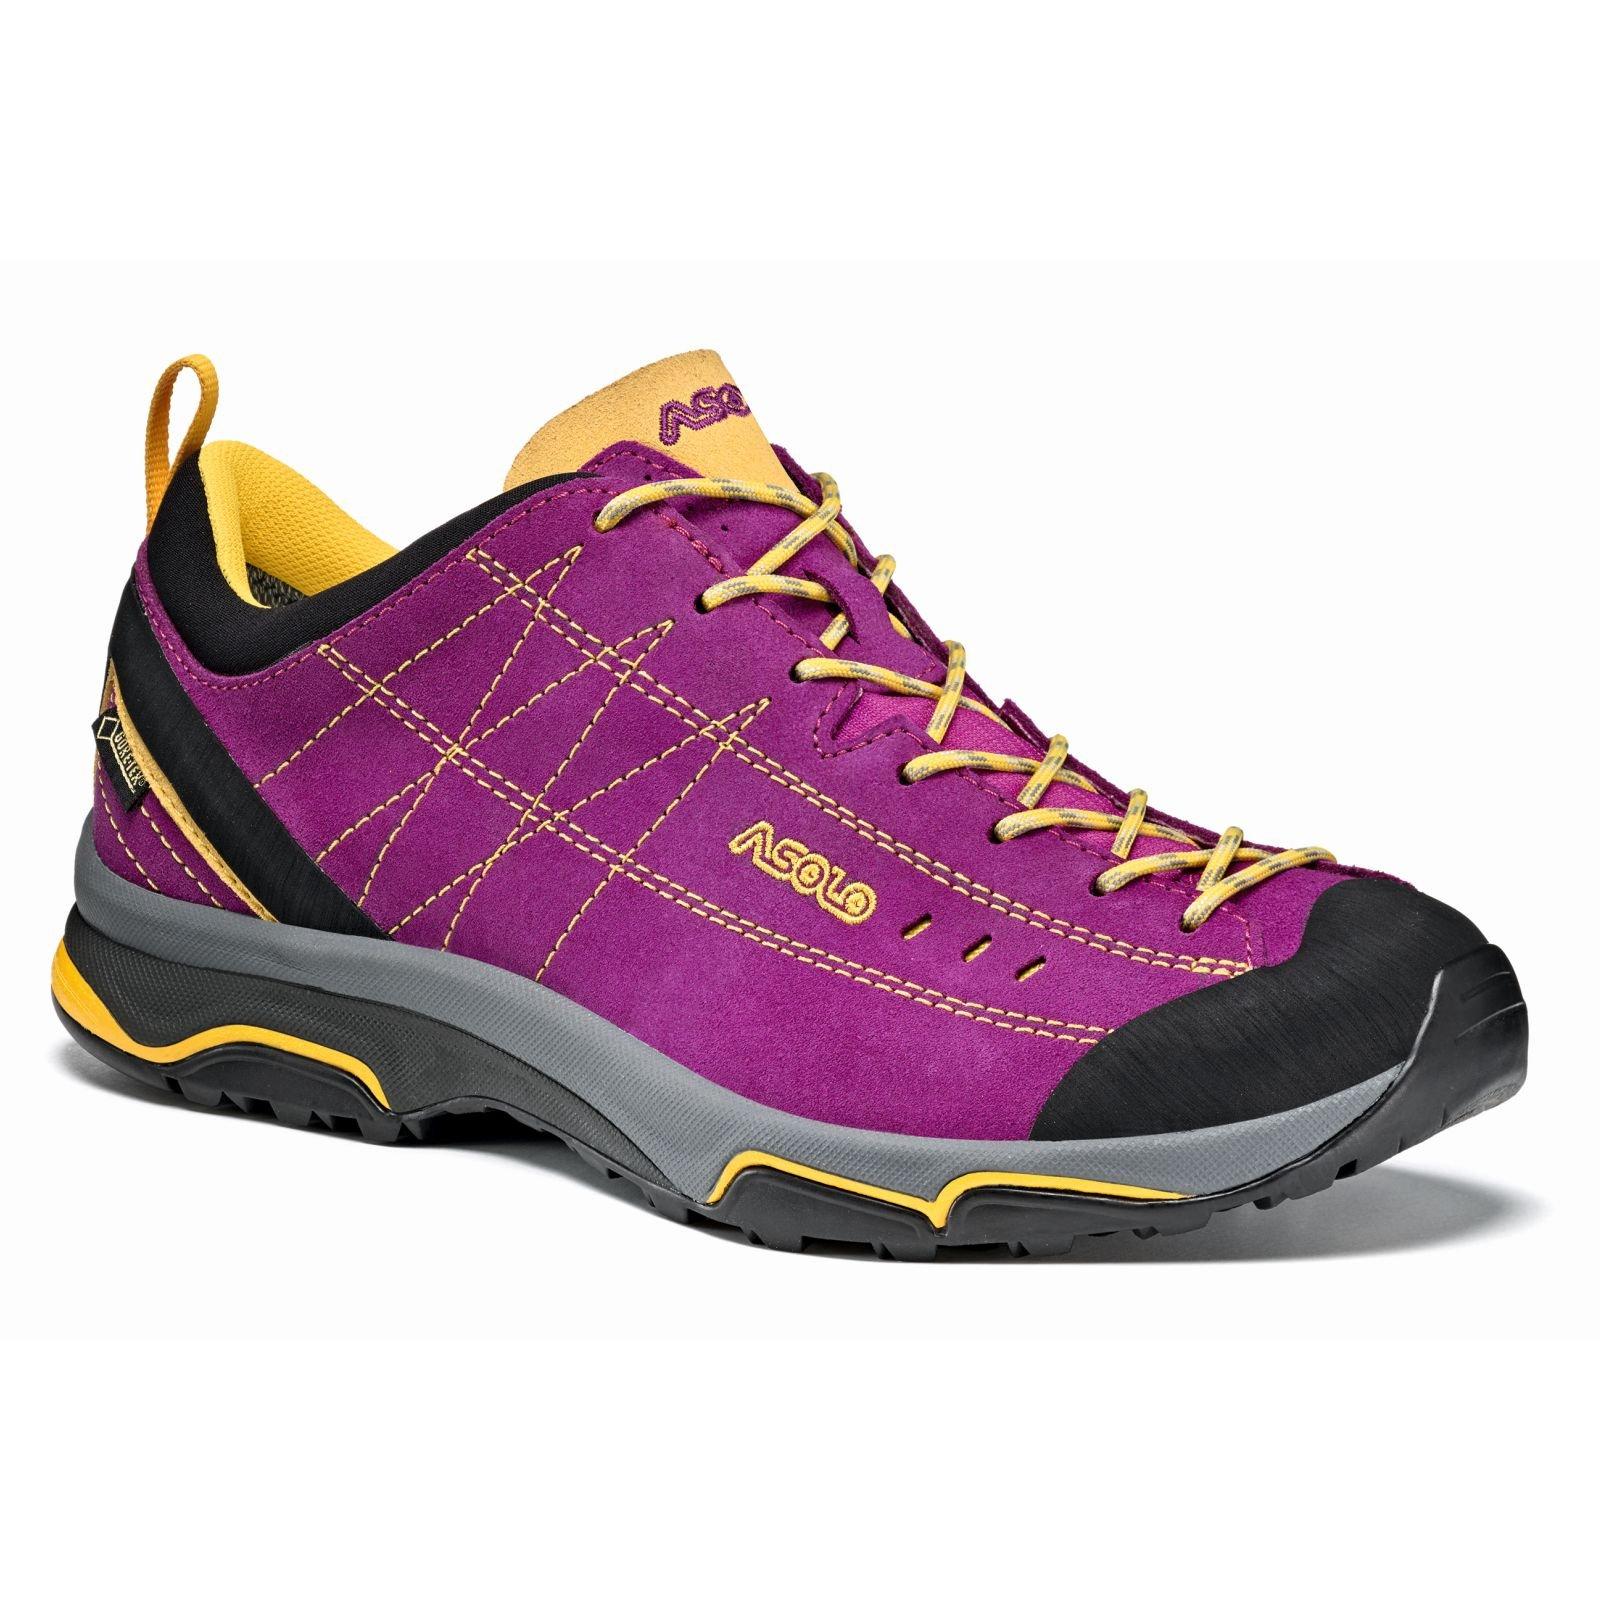 Asolo Women's Nucleon GV Hiking Shoe Verbena/Yellow - 6.5 by Asolo (Image #1)